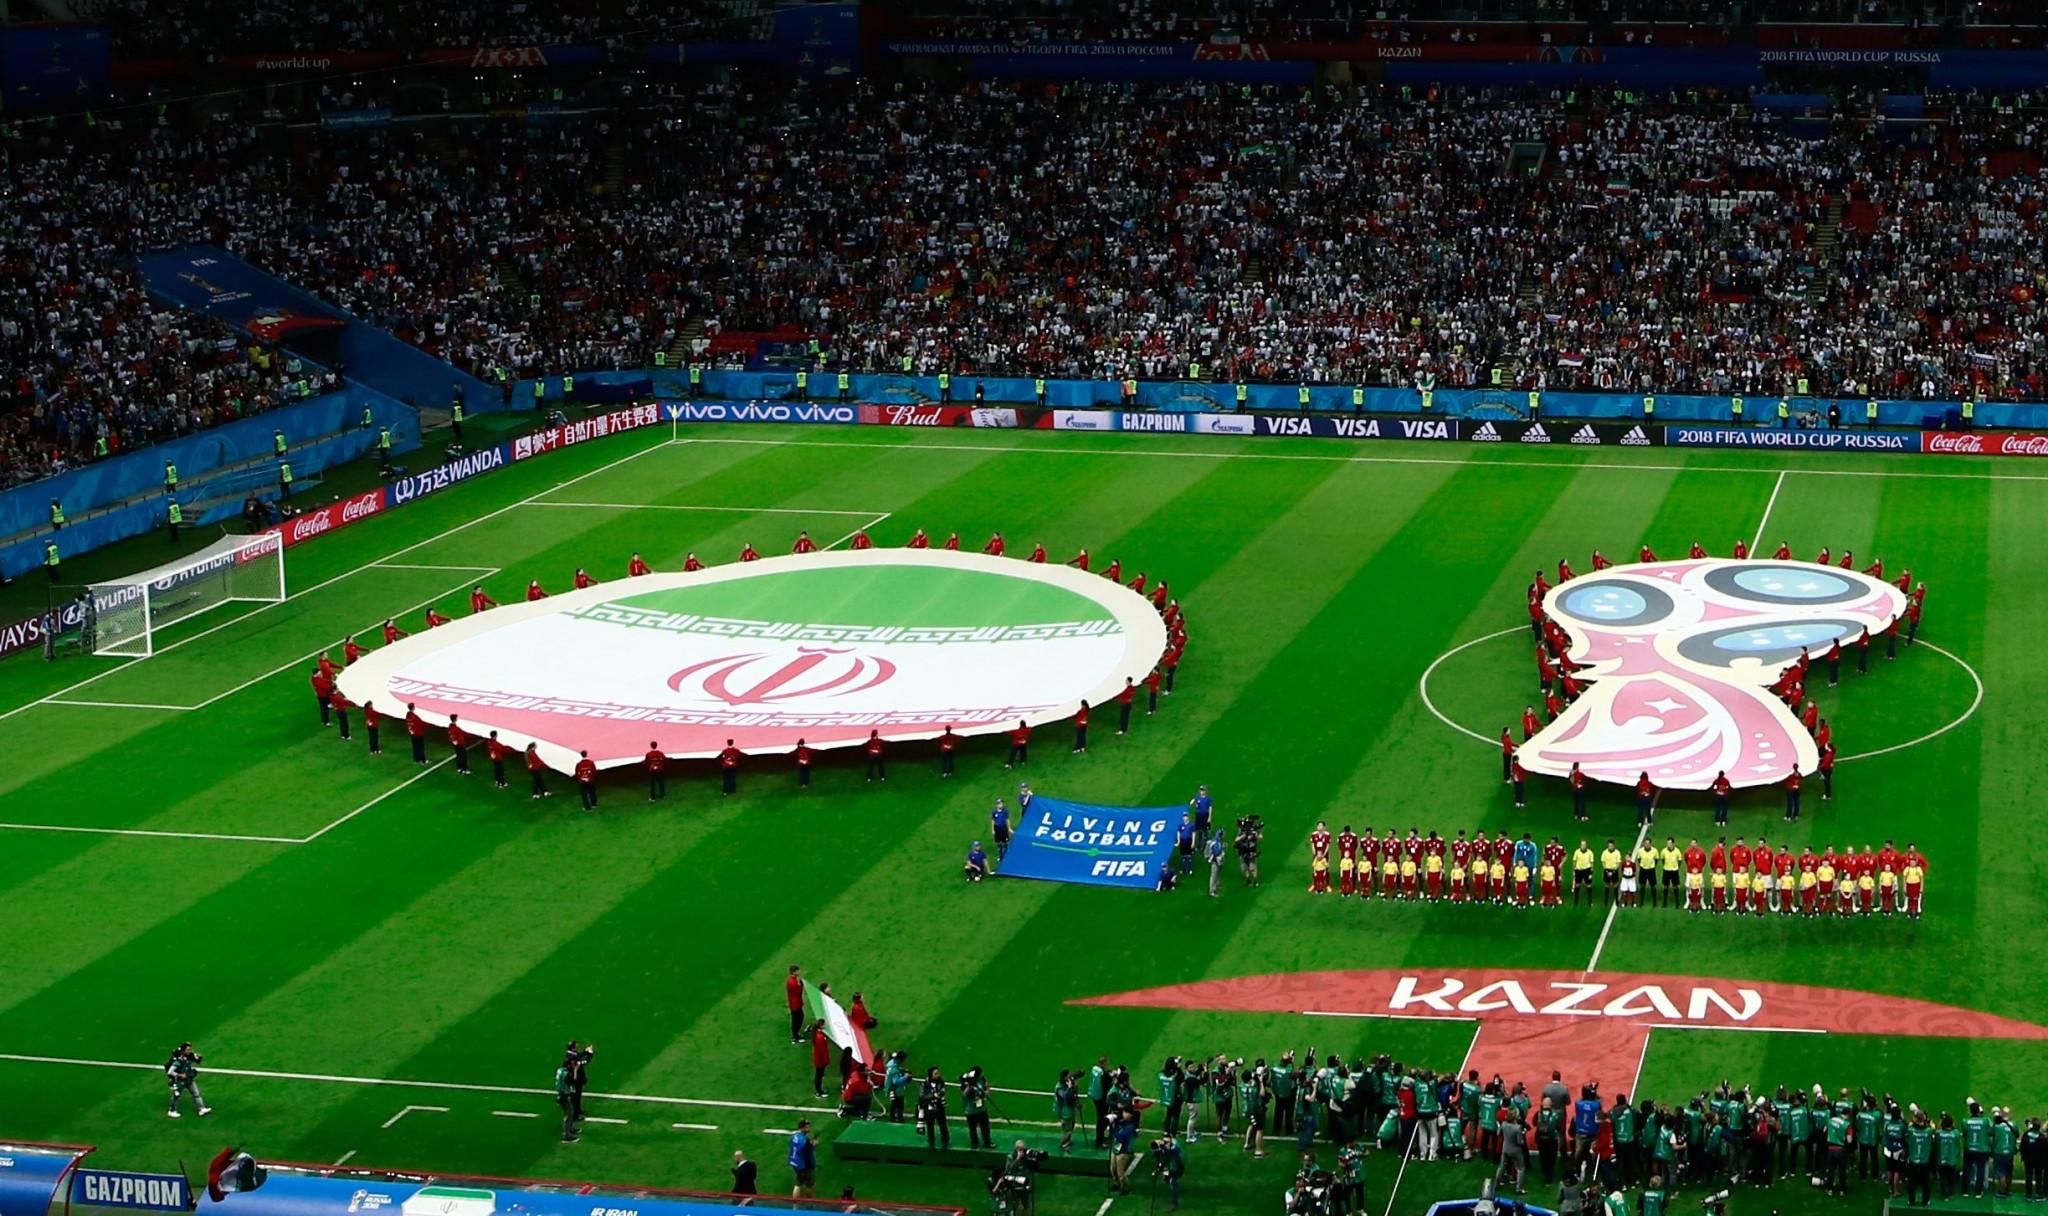 Long-awaited Football Federation Islamic Republic of Iran election set for February 28